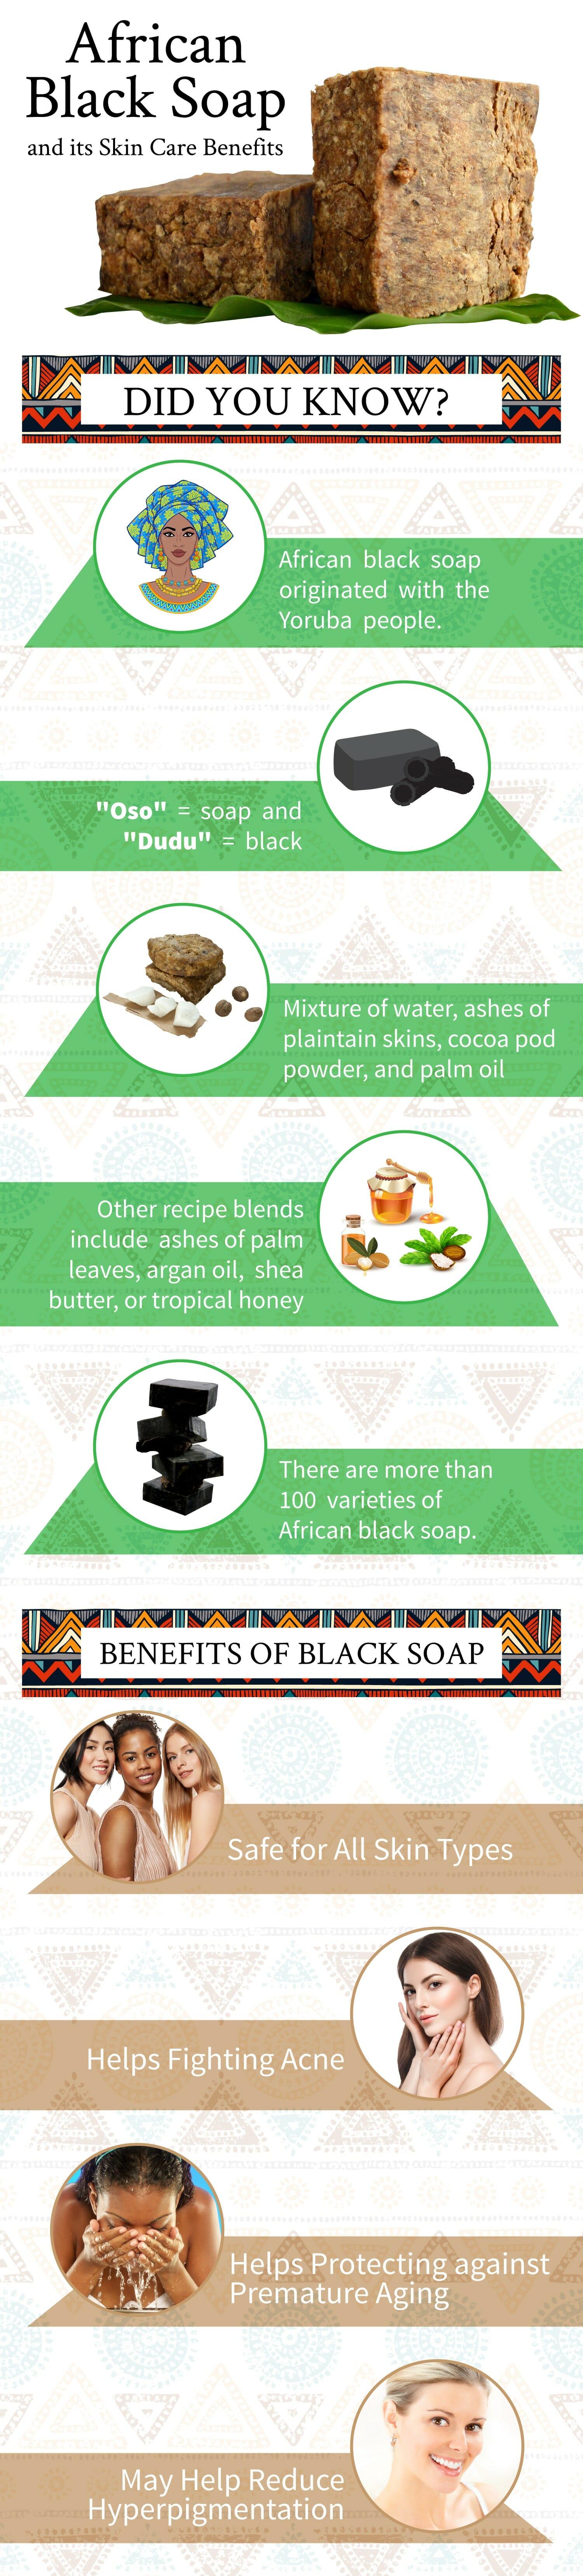 infographic black soap